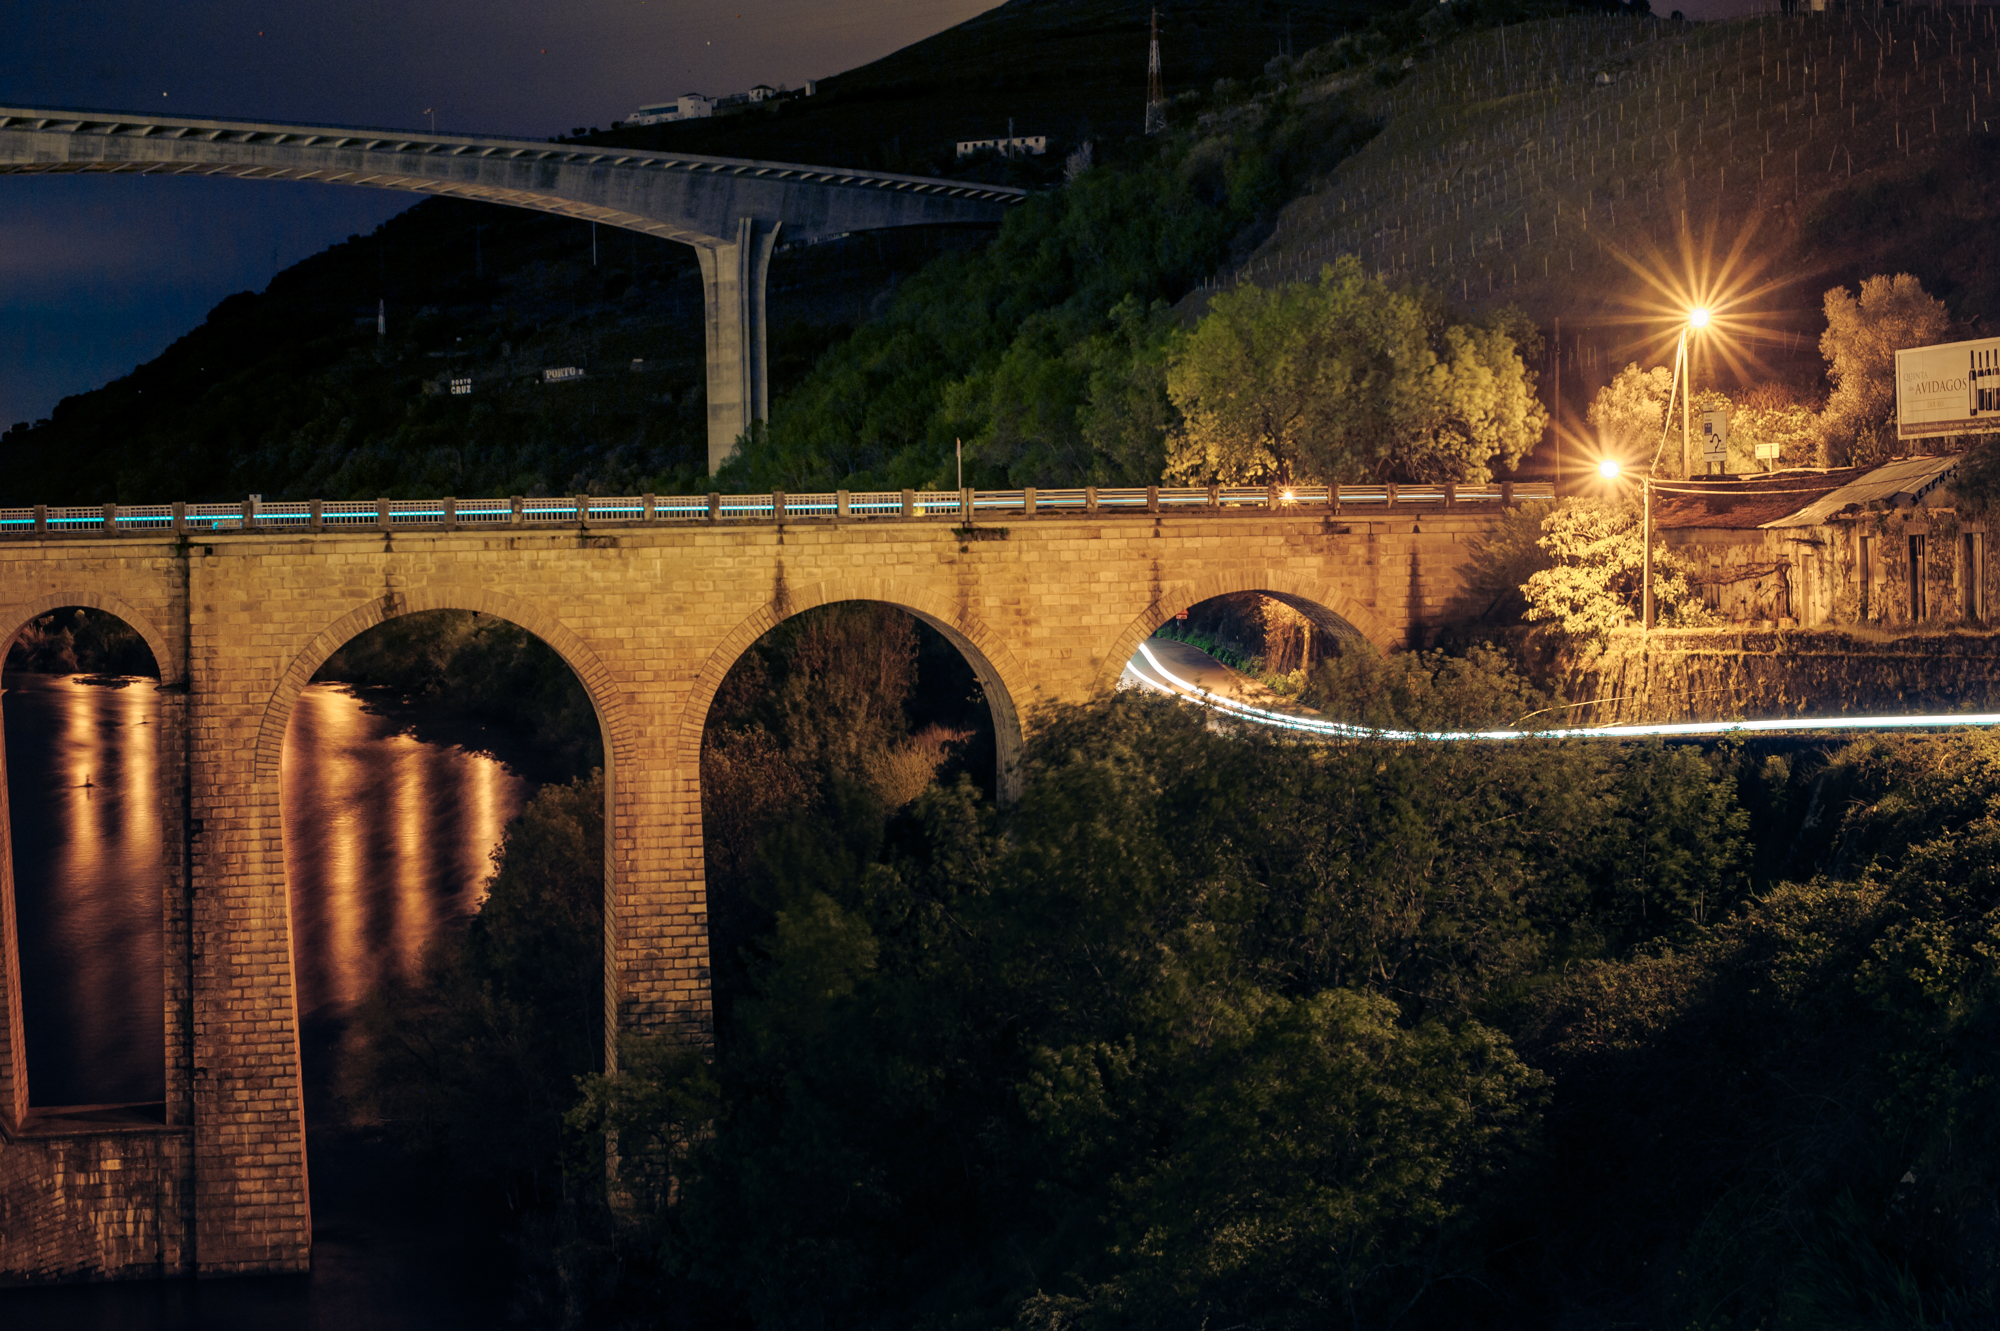 Bridges of Régua, Portugal